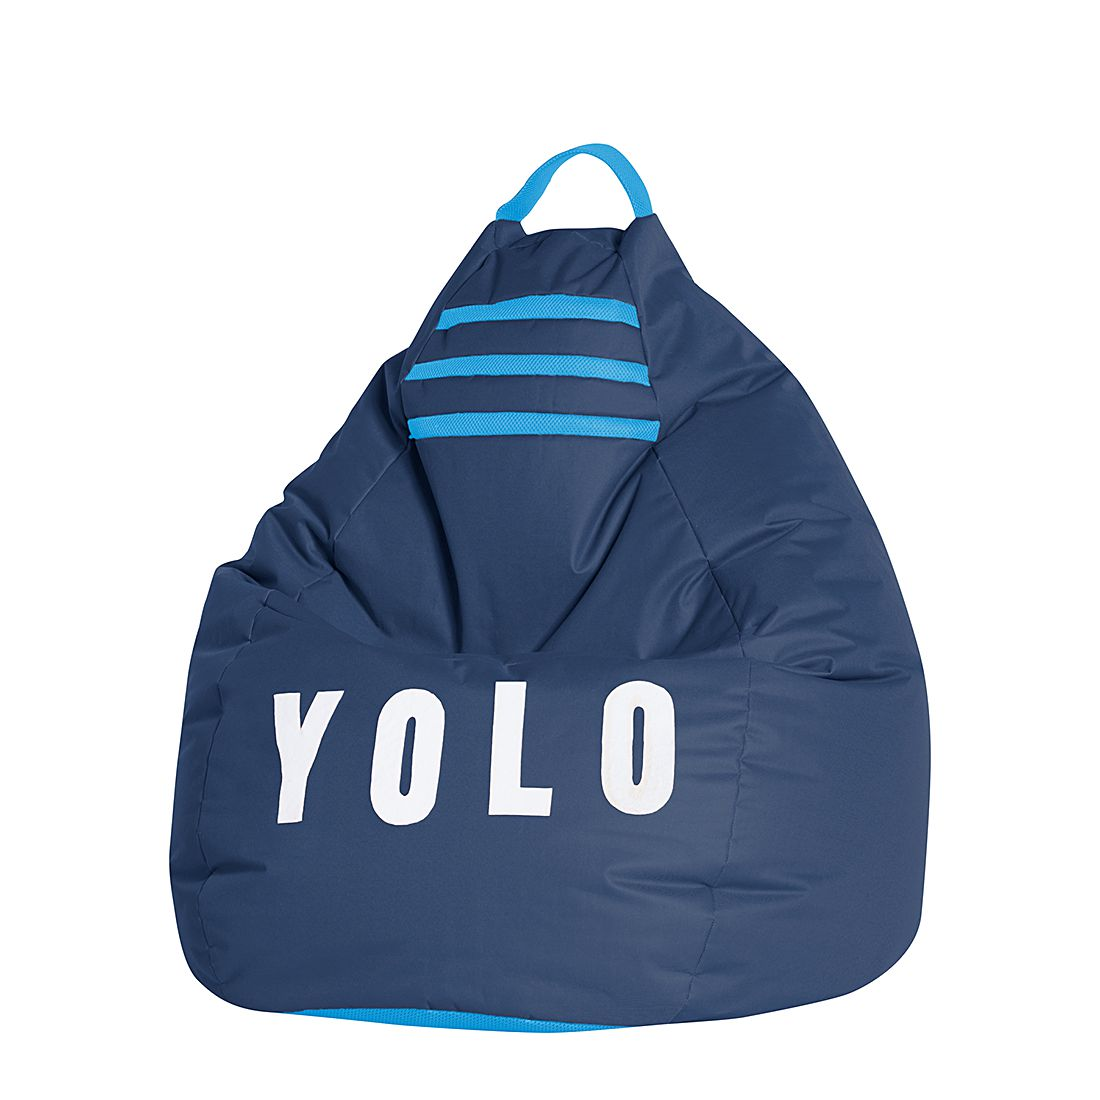 Sitzsack BeanBag Yolo XL – Blau, Fredriks bestellen